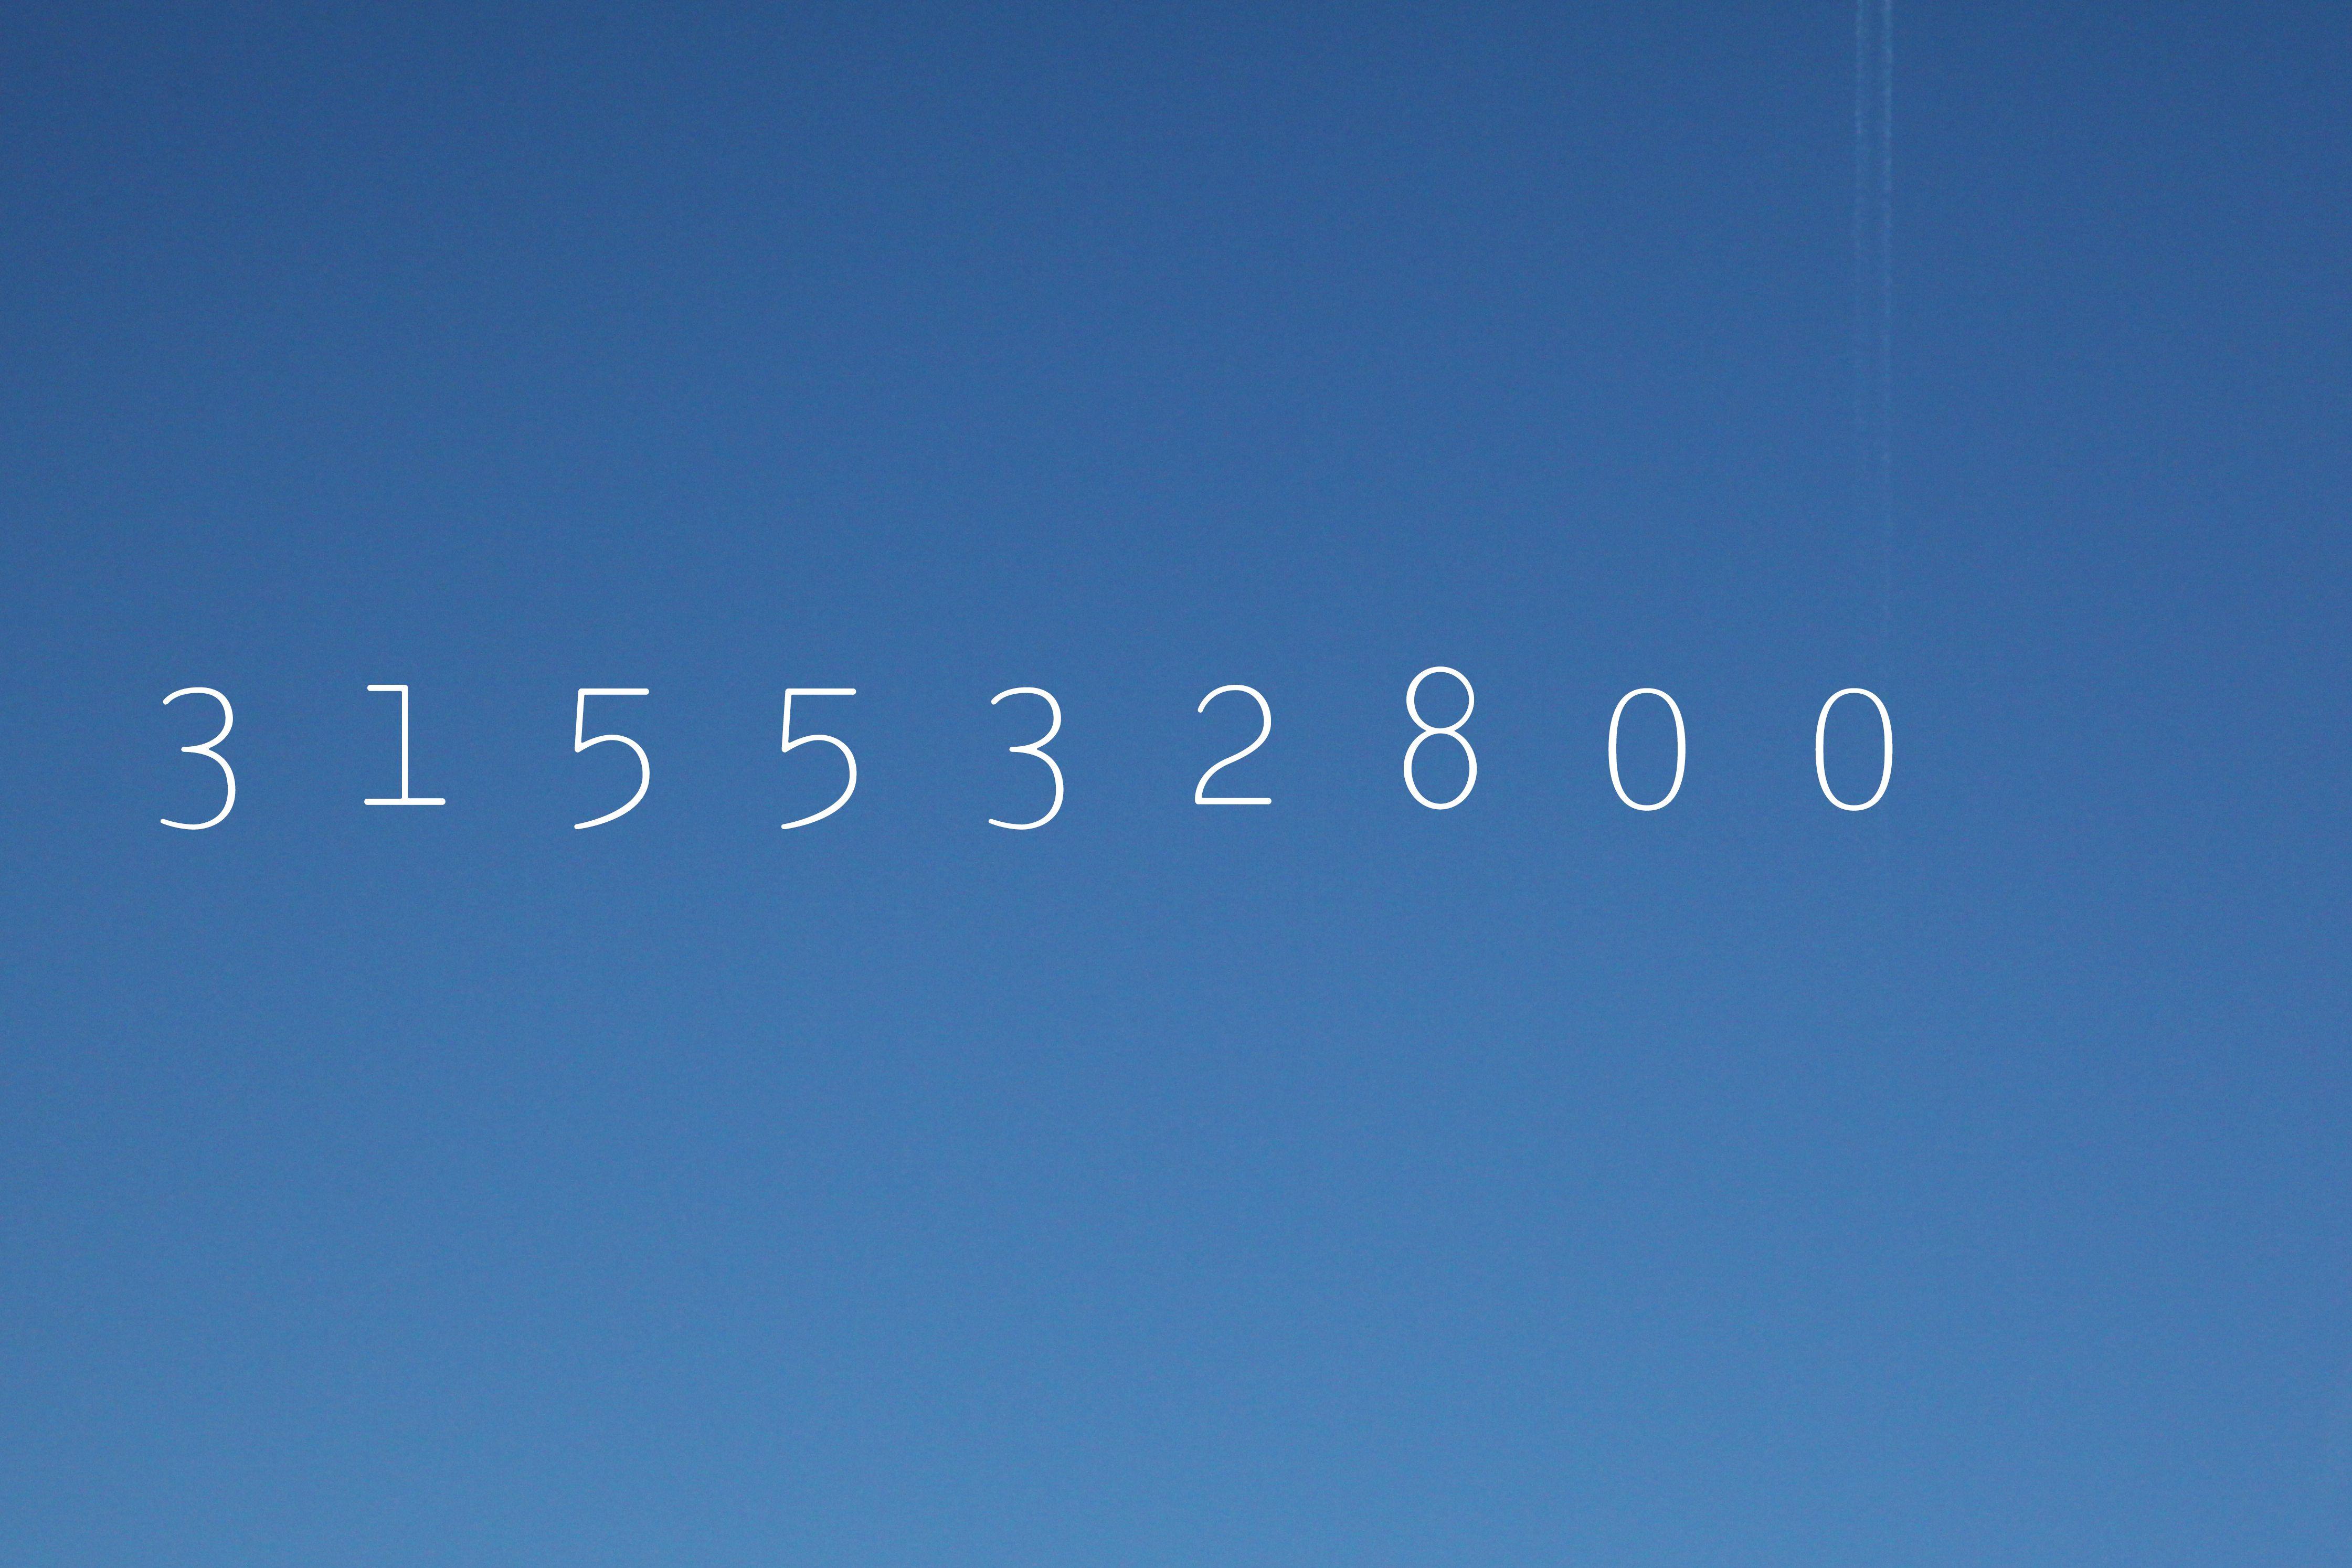 Leap Second, 31 December 1979 - 23:59:60